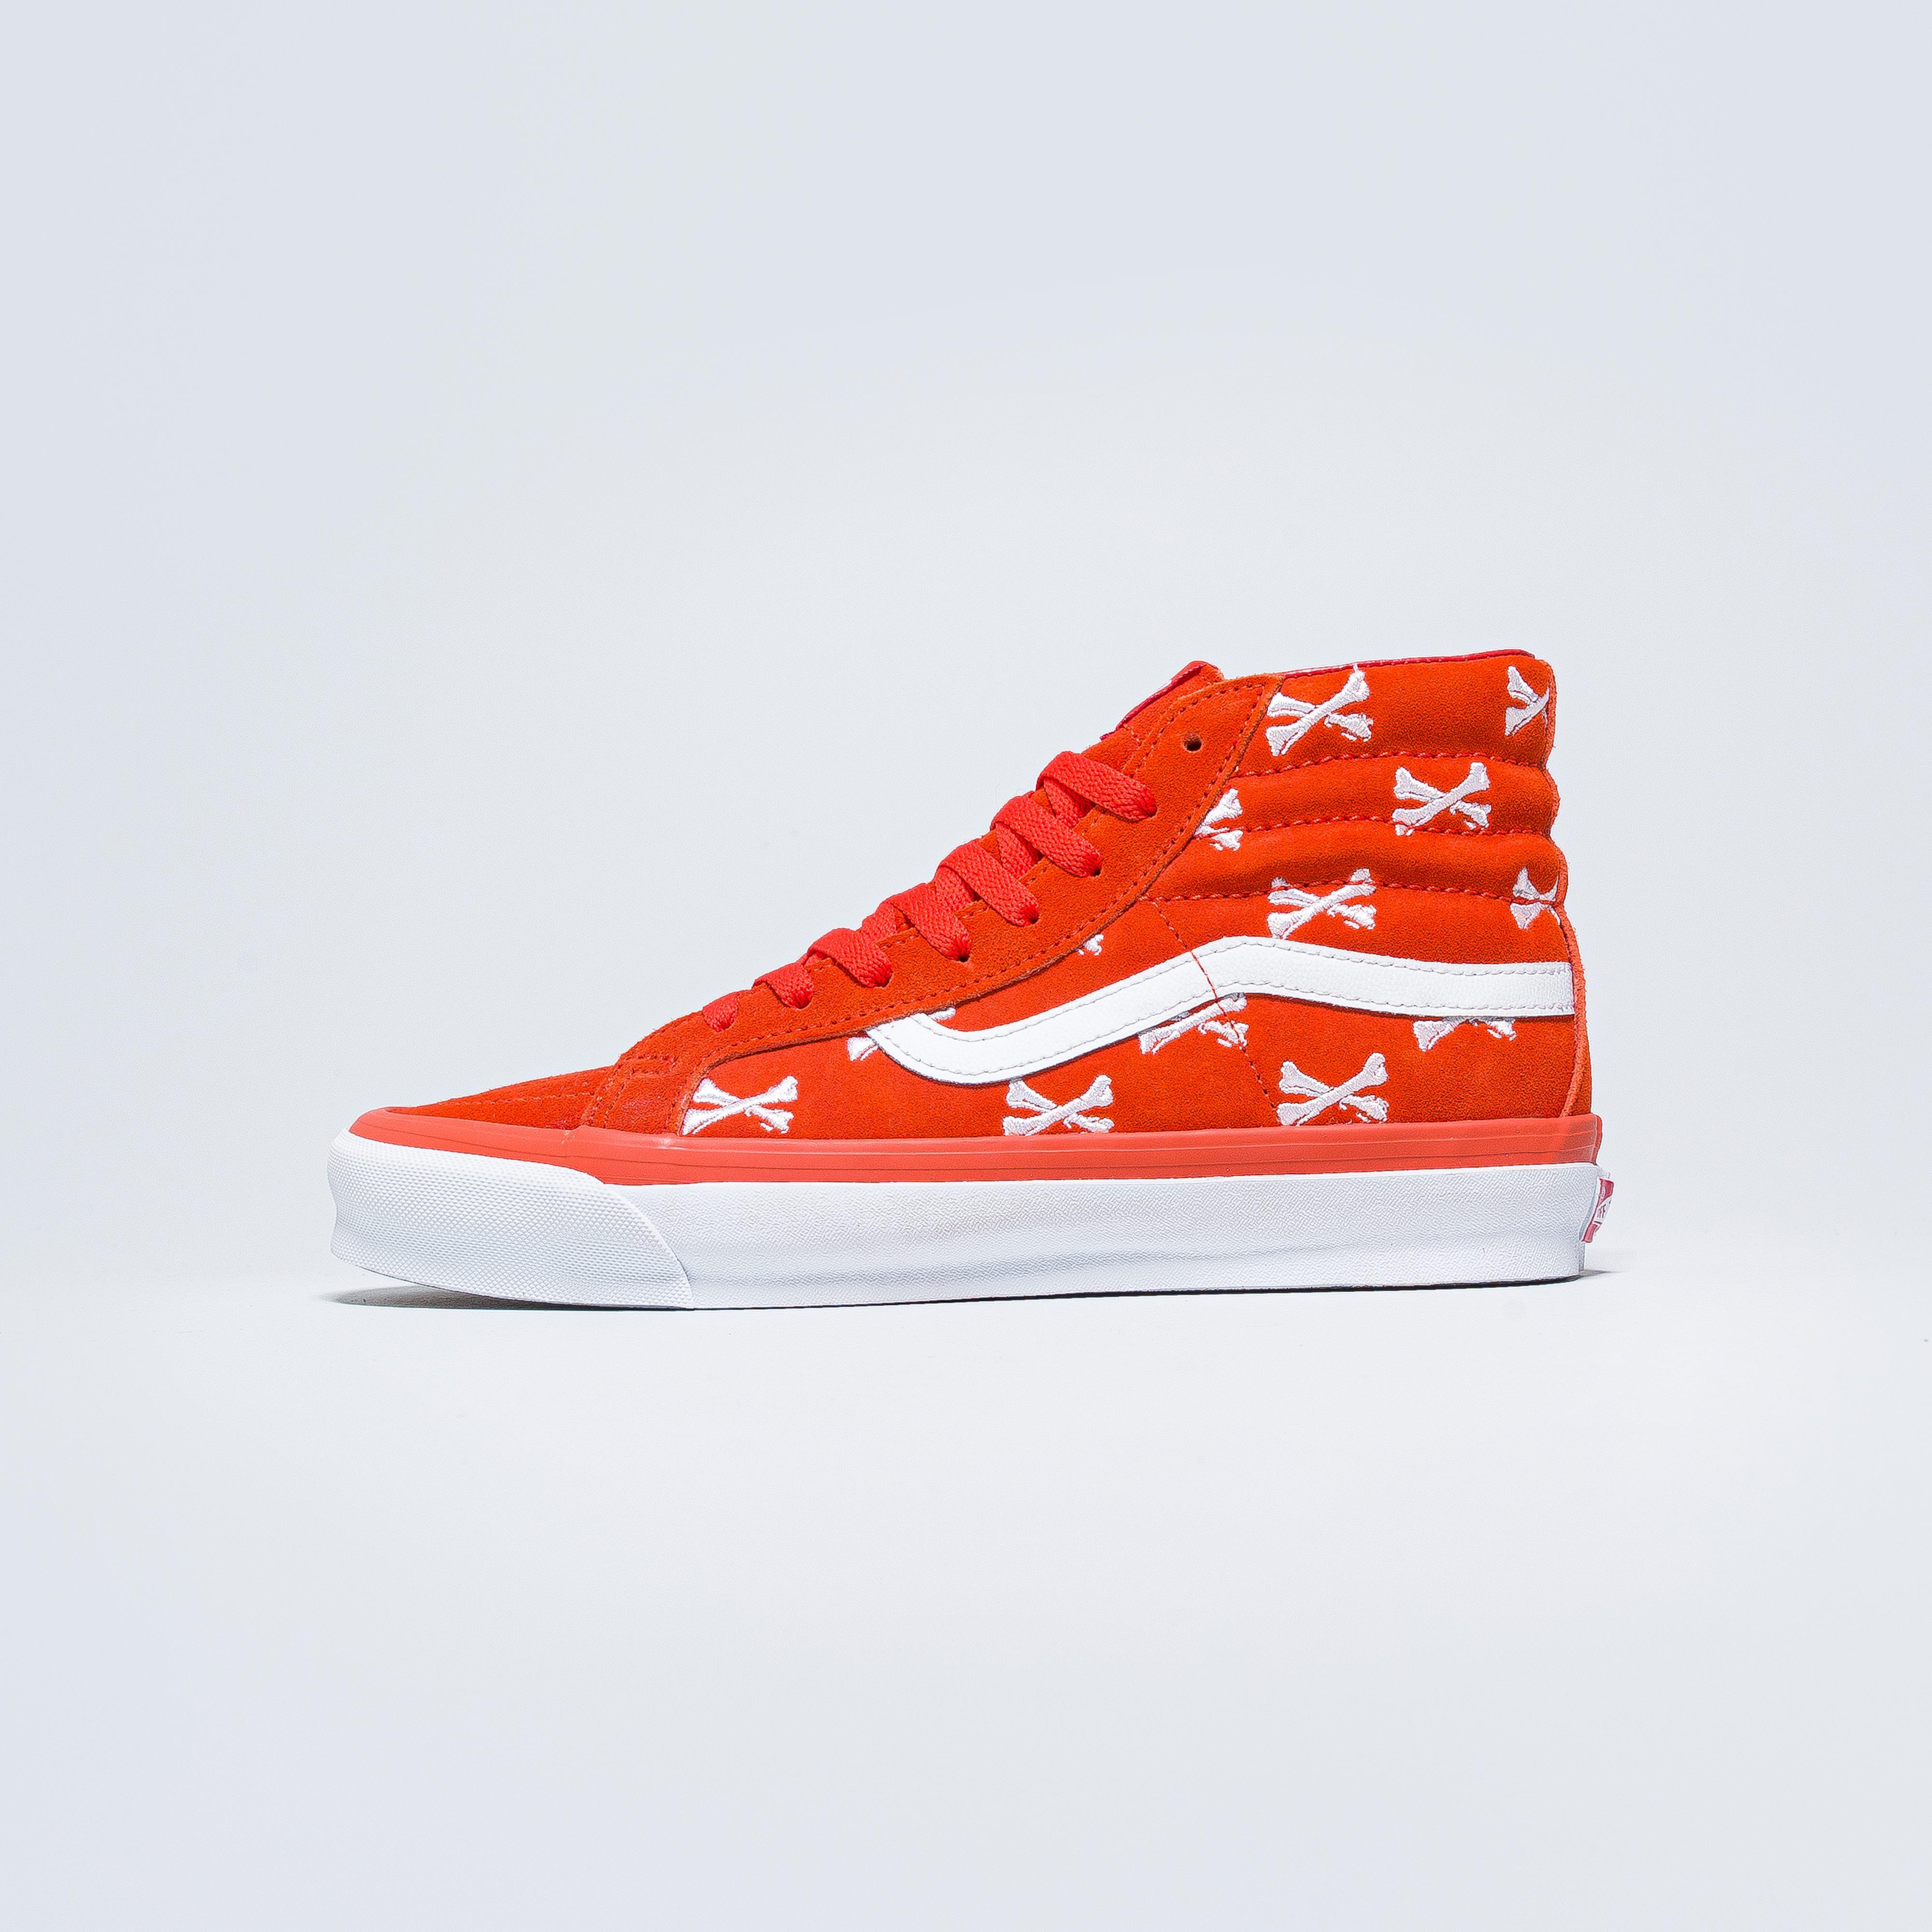 Vans - OG Sk8-Hi LX x Wtaps - Bones/Orange - Up There